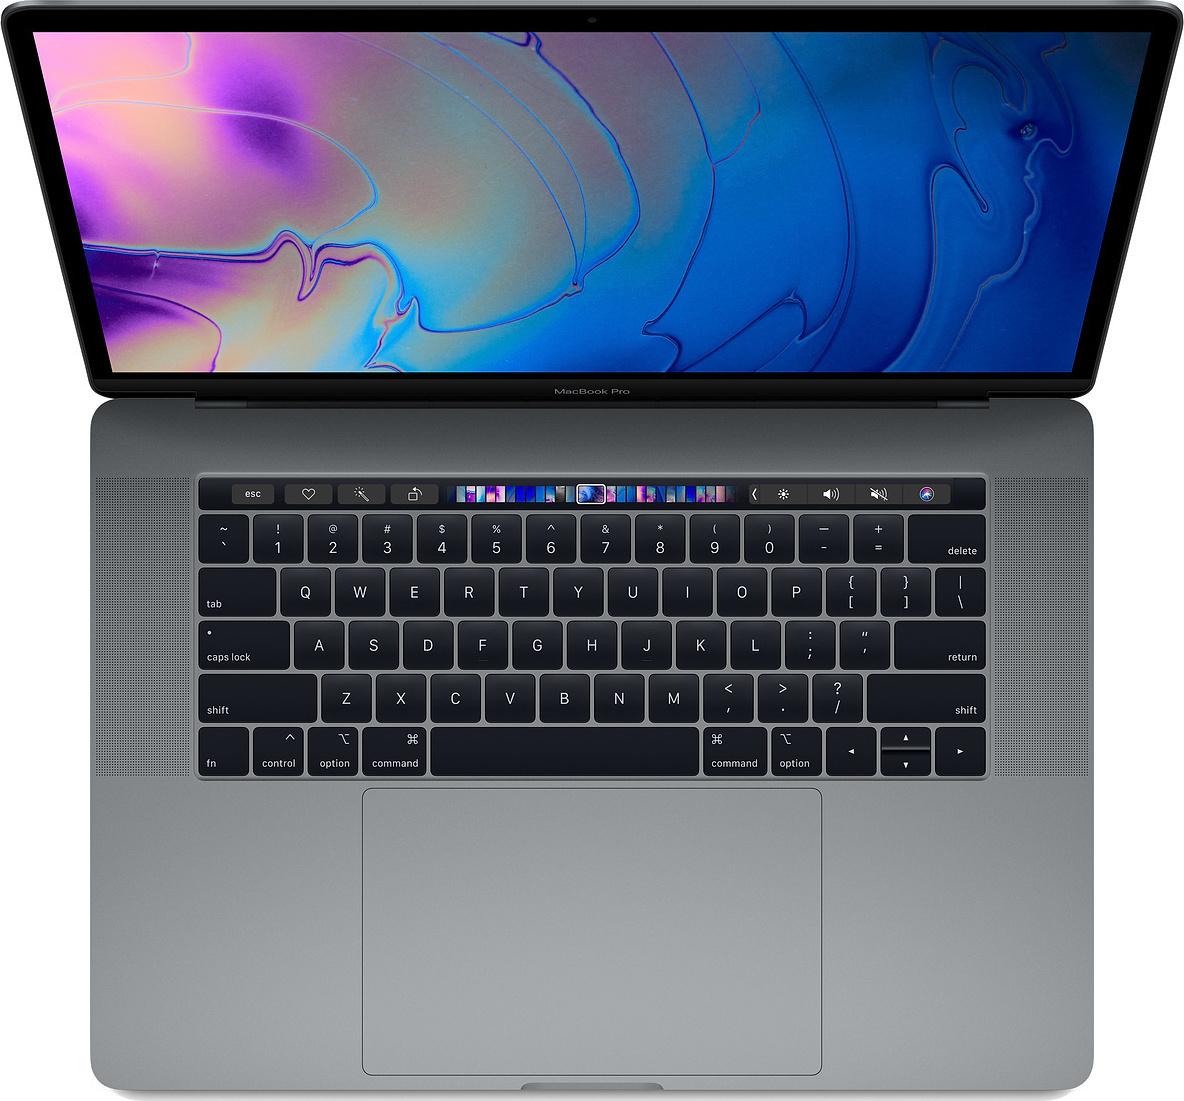 Apple MacBook Pro MR932 15.4'' 2.2GHz i7-8750H/16GB/256GB With Touch Bar 2018 Space Grey English Keyboard Με Αντάπτορα Πληρωμή έως 24 δόσεις